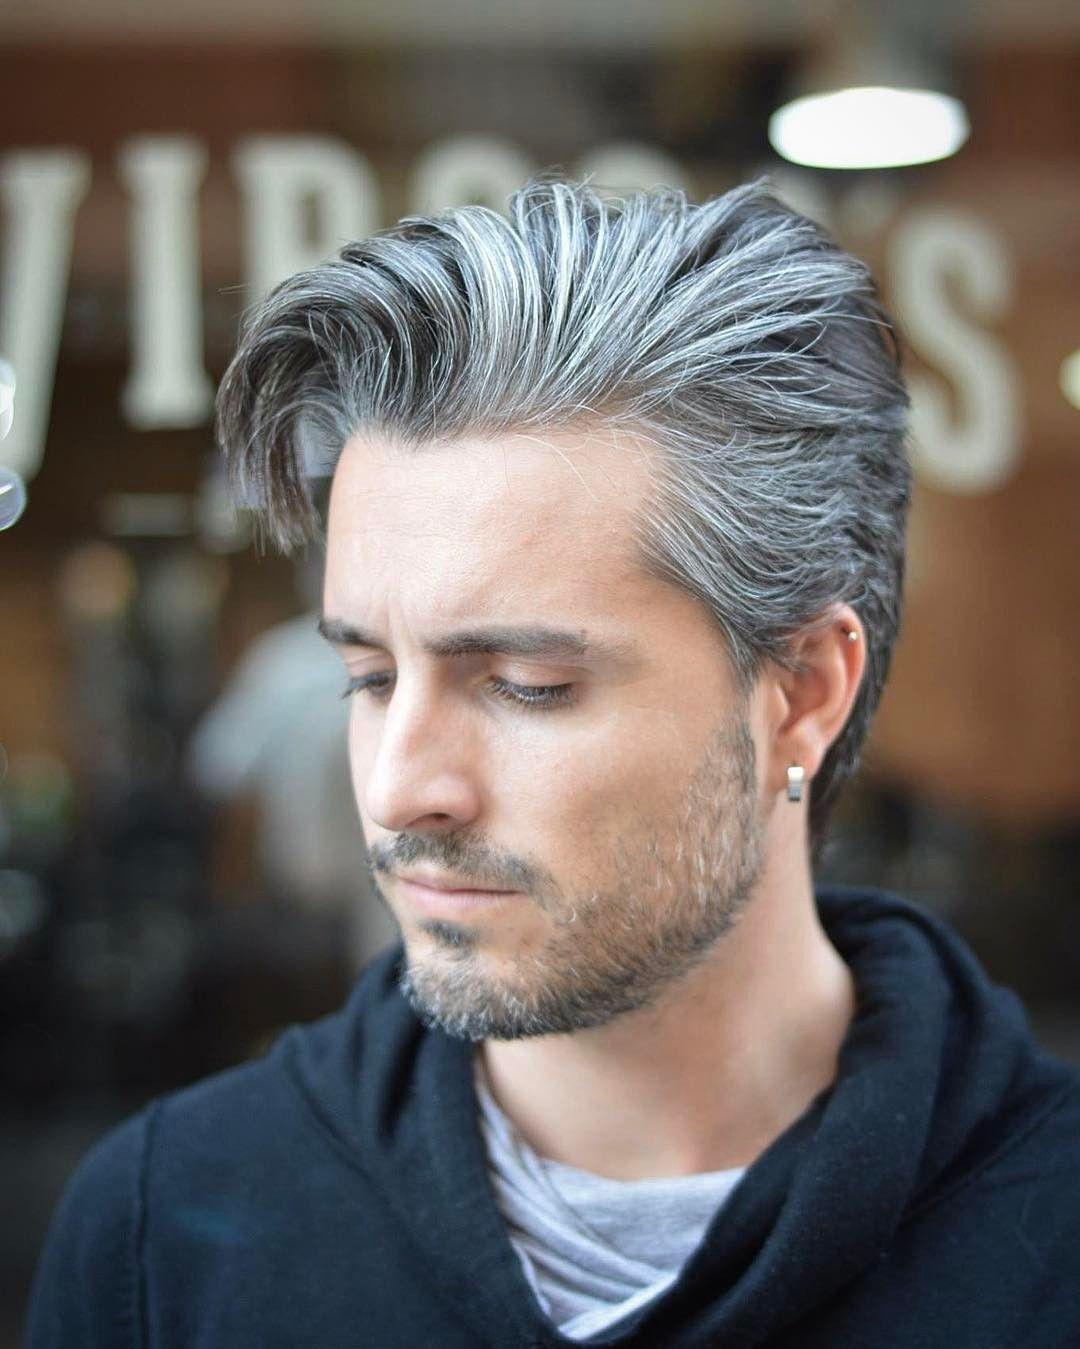 Asymmetrical Haircut Men : asymmetrical, haircut, Awesome, Asymmetrical, Haircuts, Hairstyles, Short,